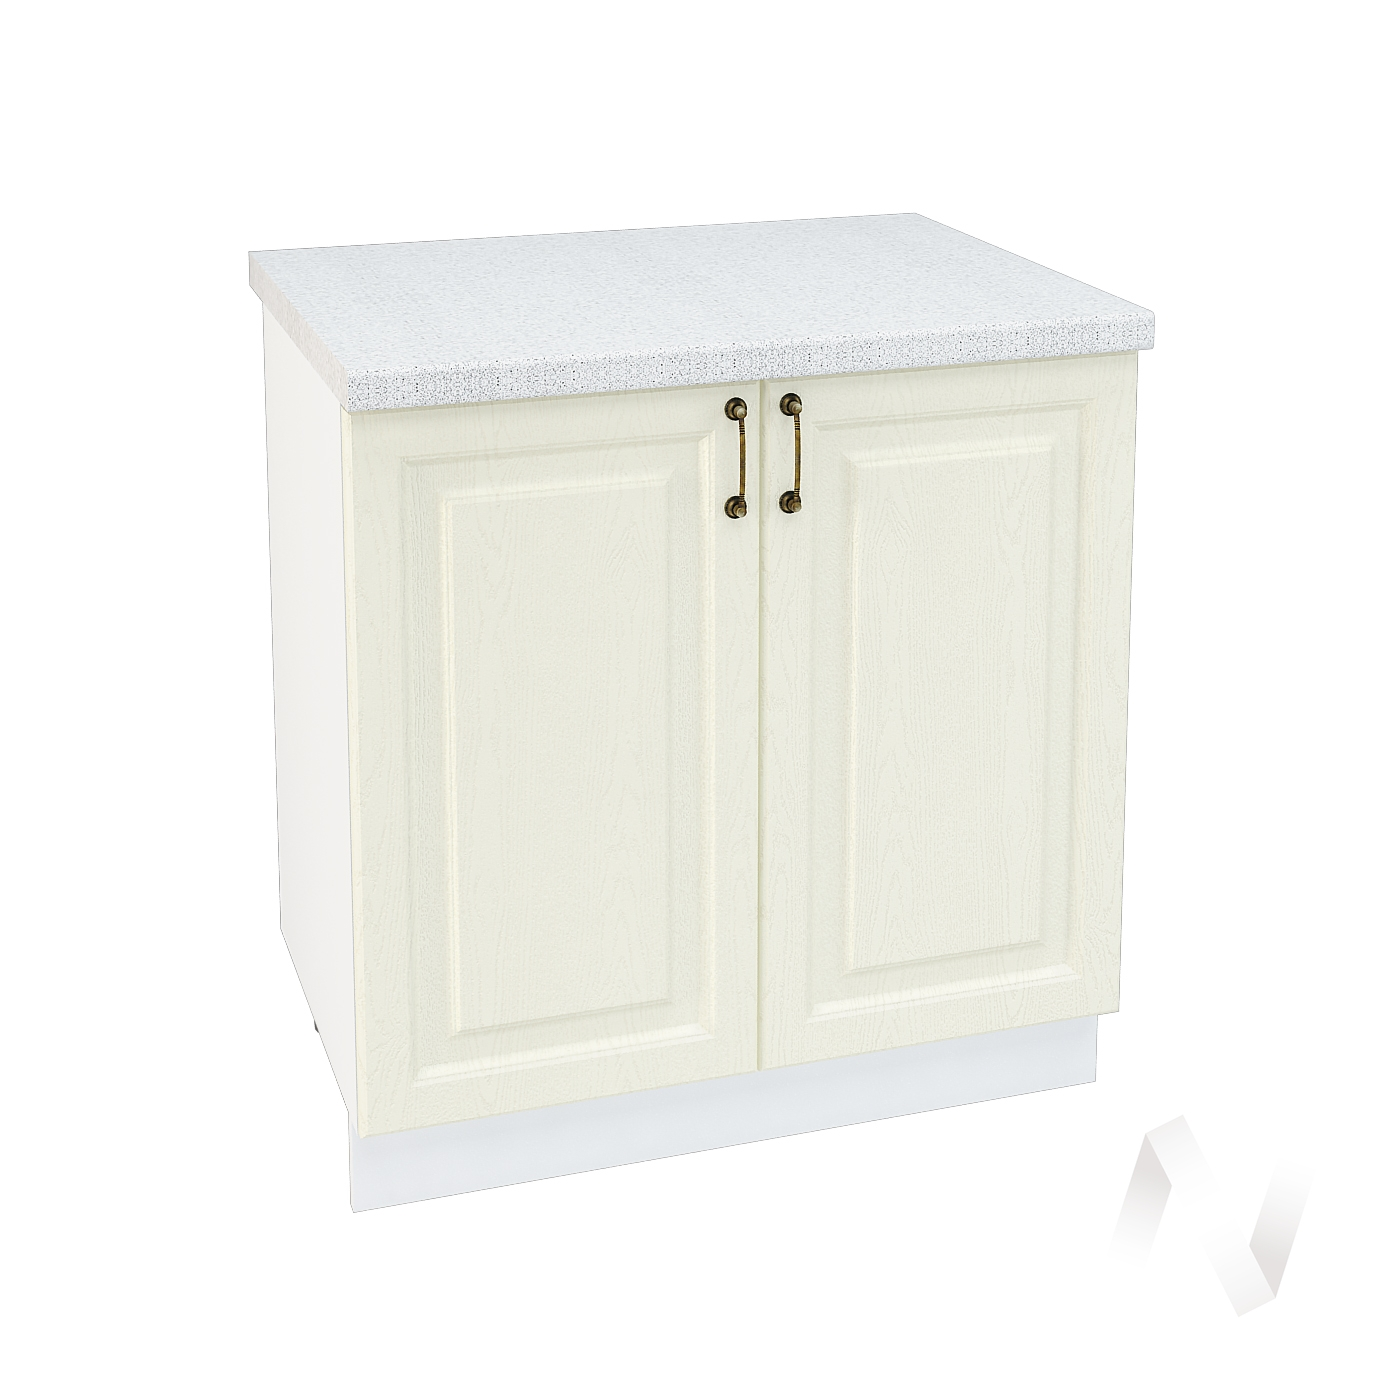 "Кухня ""Ницца"": Шкаф нижний 800, ШН 800 (Крем/корпус белый)"